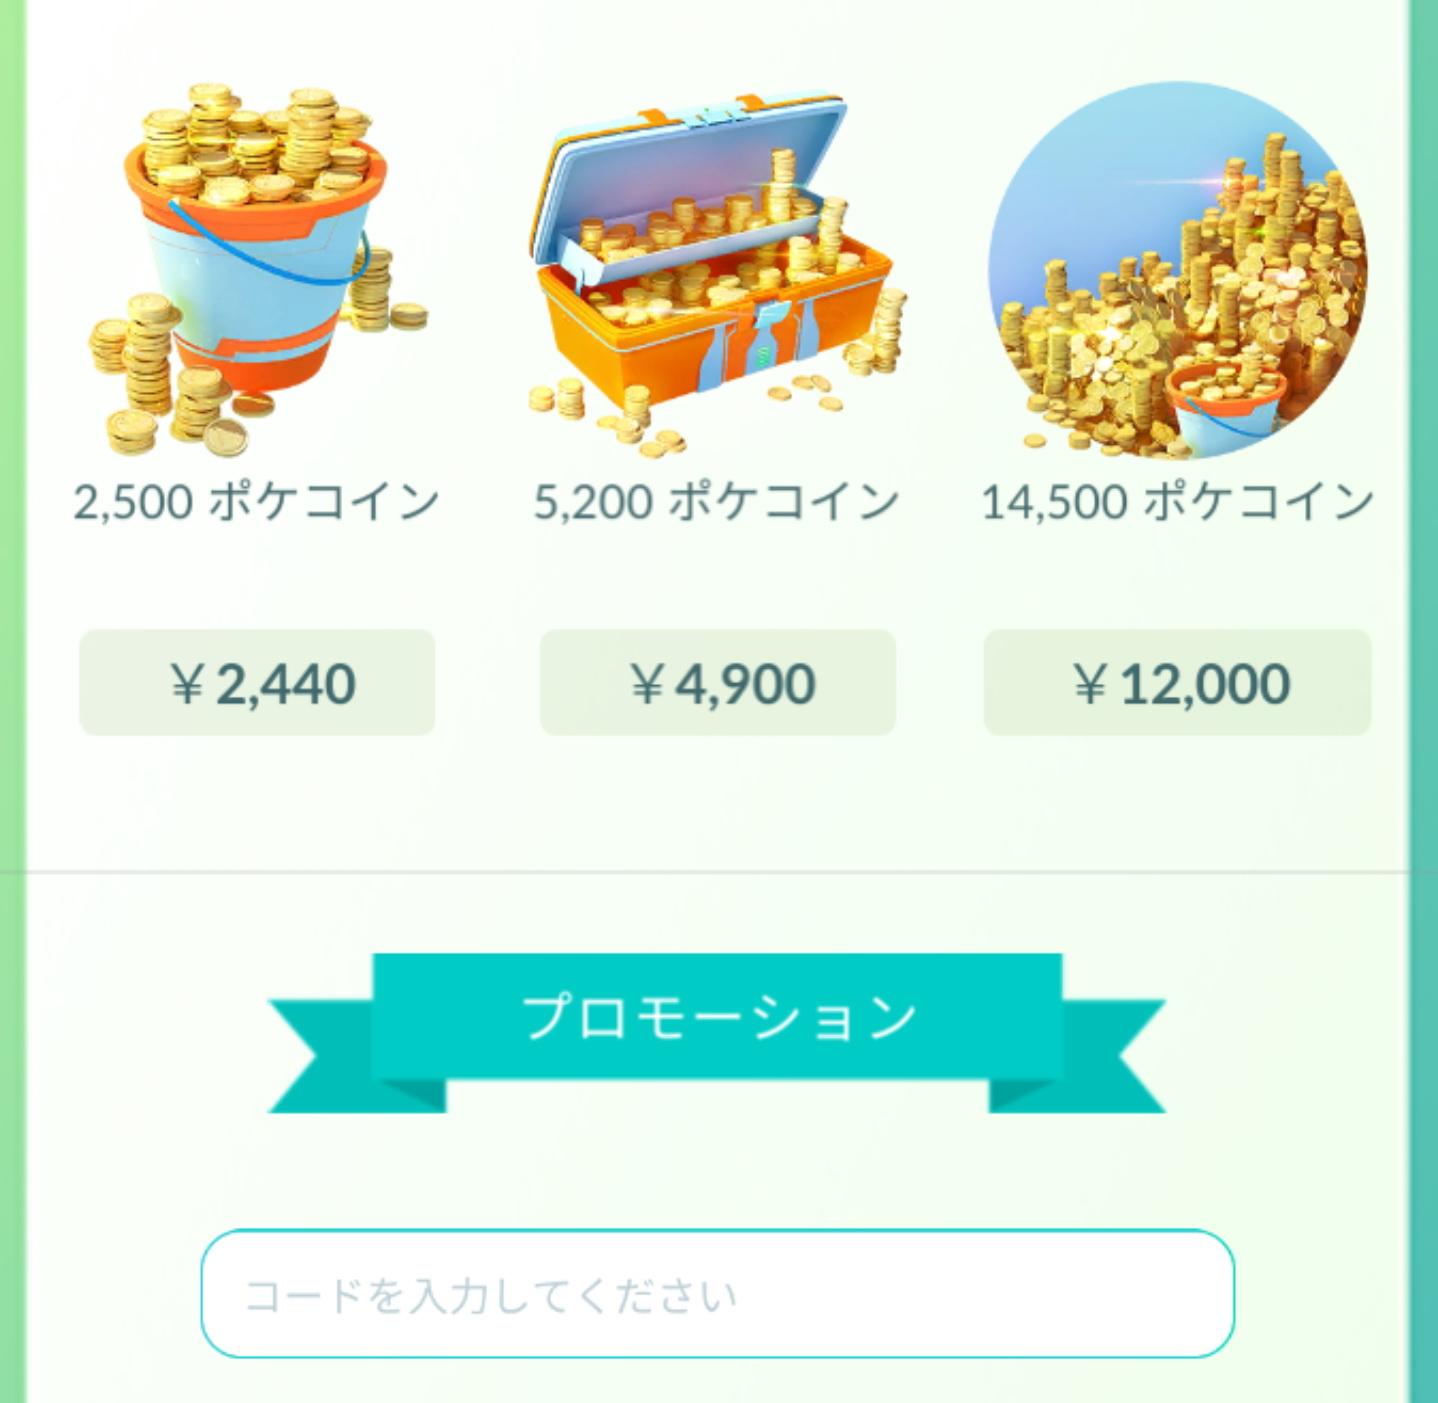 PoekmonGO_Promotion